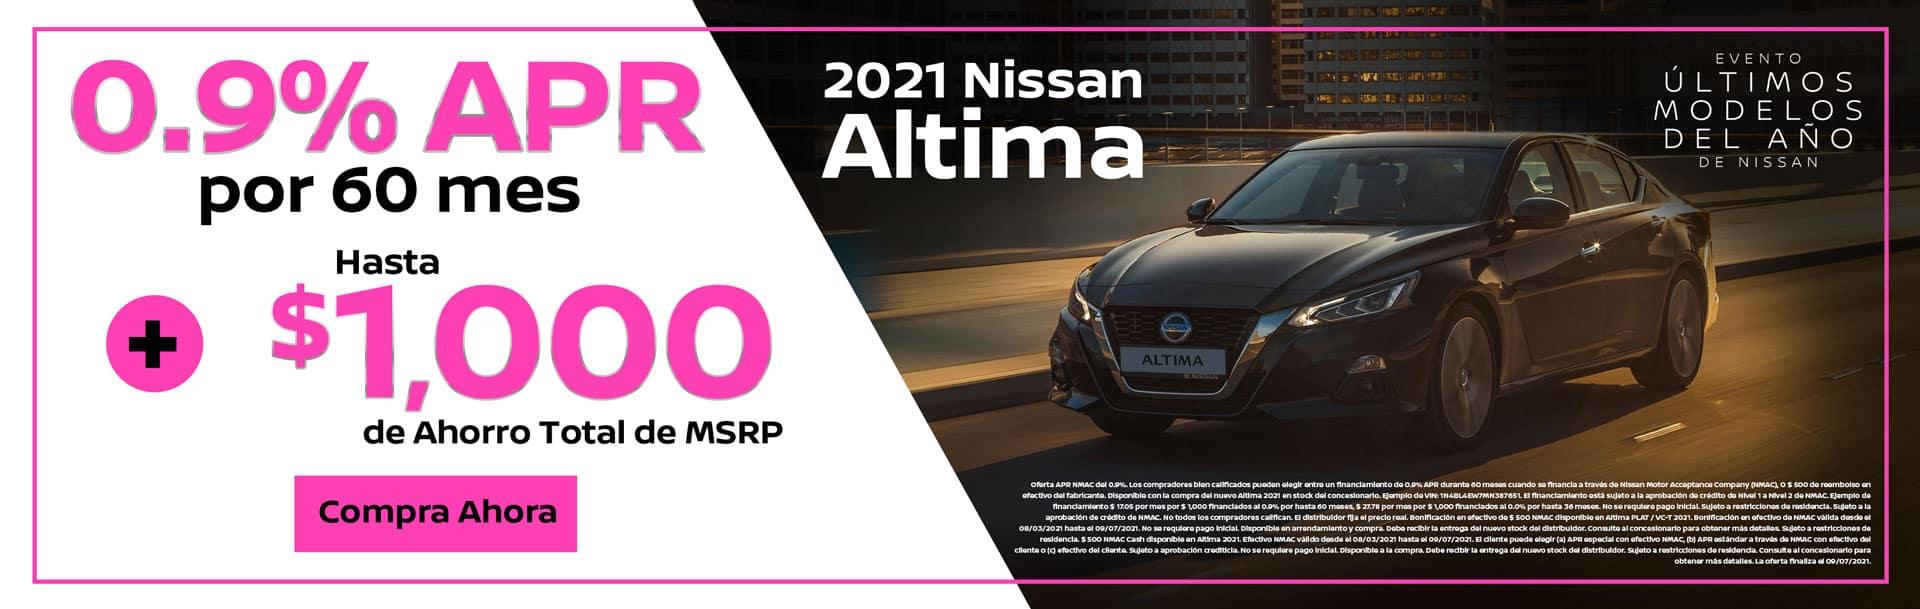 Oferta de 2021 Nissan Altima en Spokane, WA